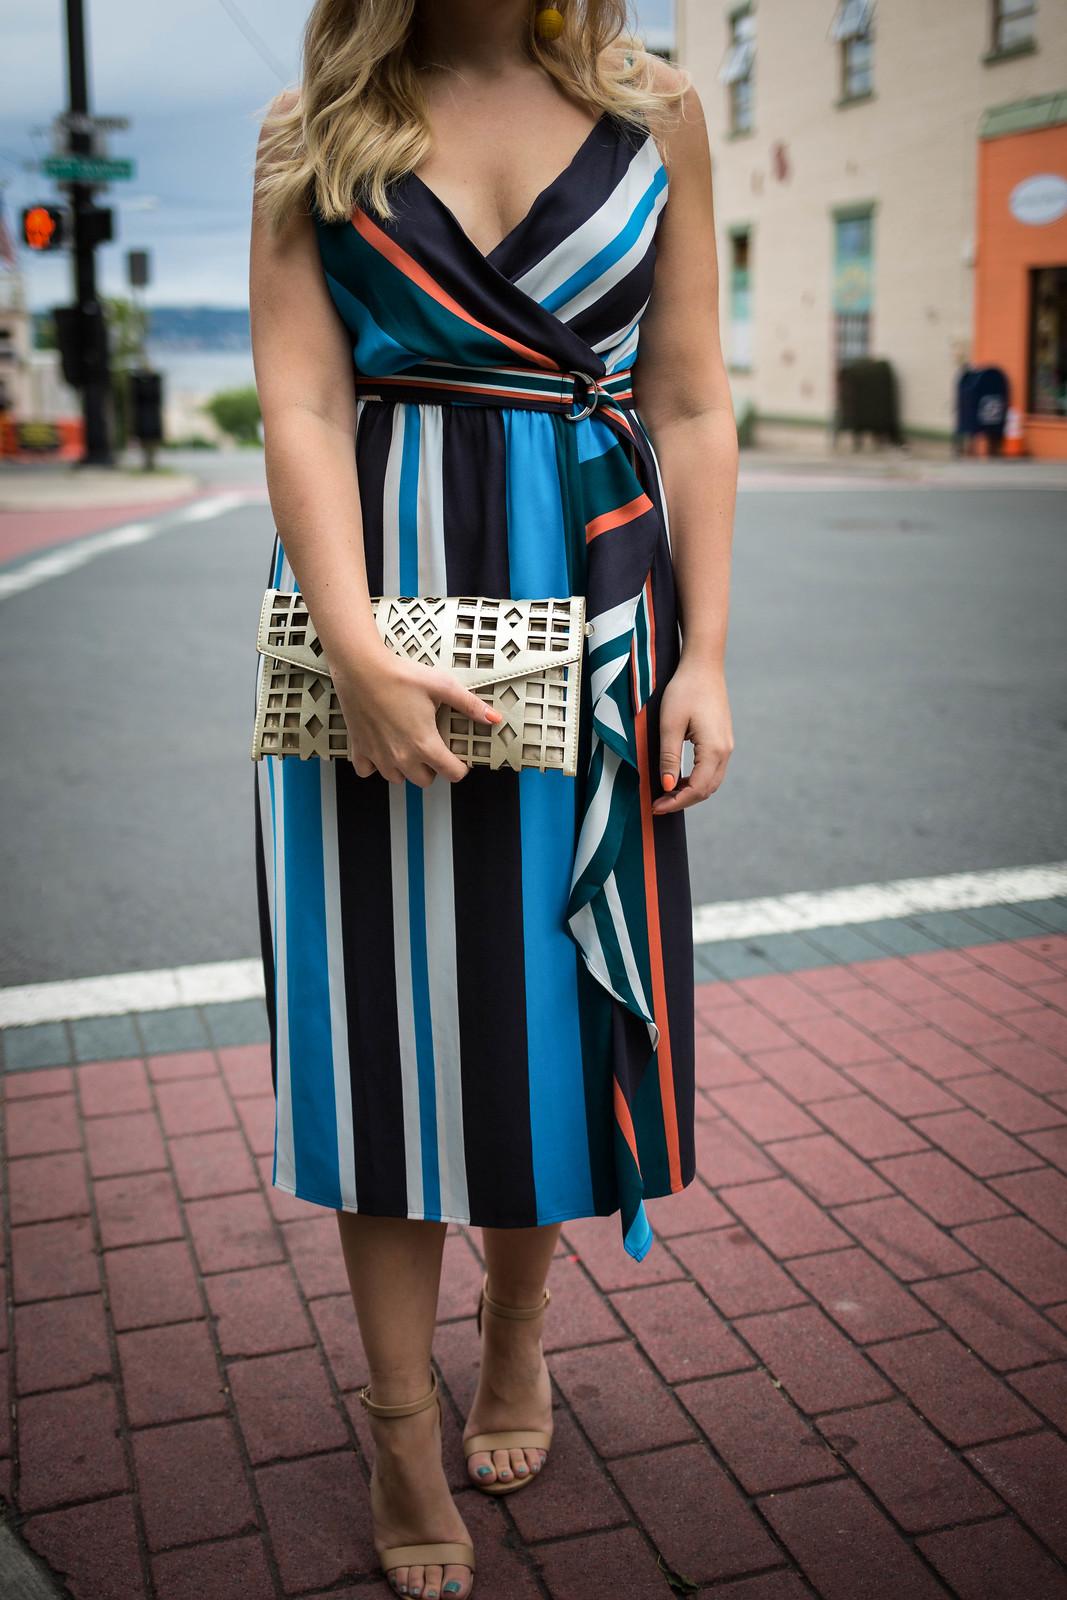 Blue Stripe Midi Dress | Fall Wedding Outfit Inspiration | Wedding Attire